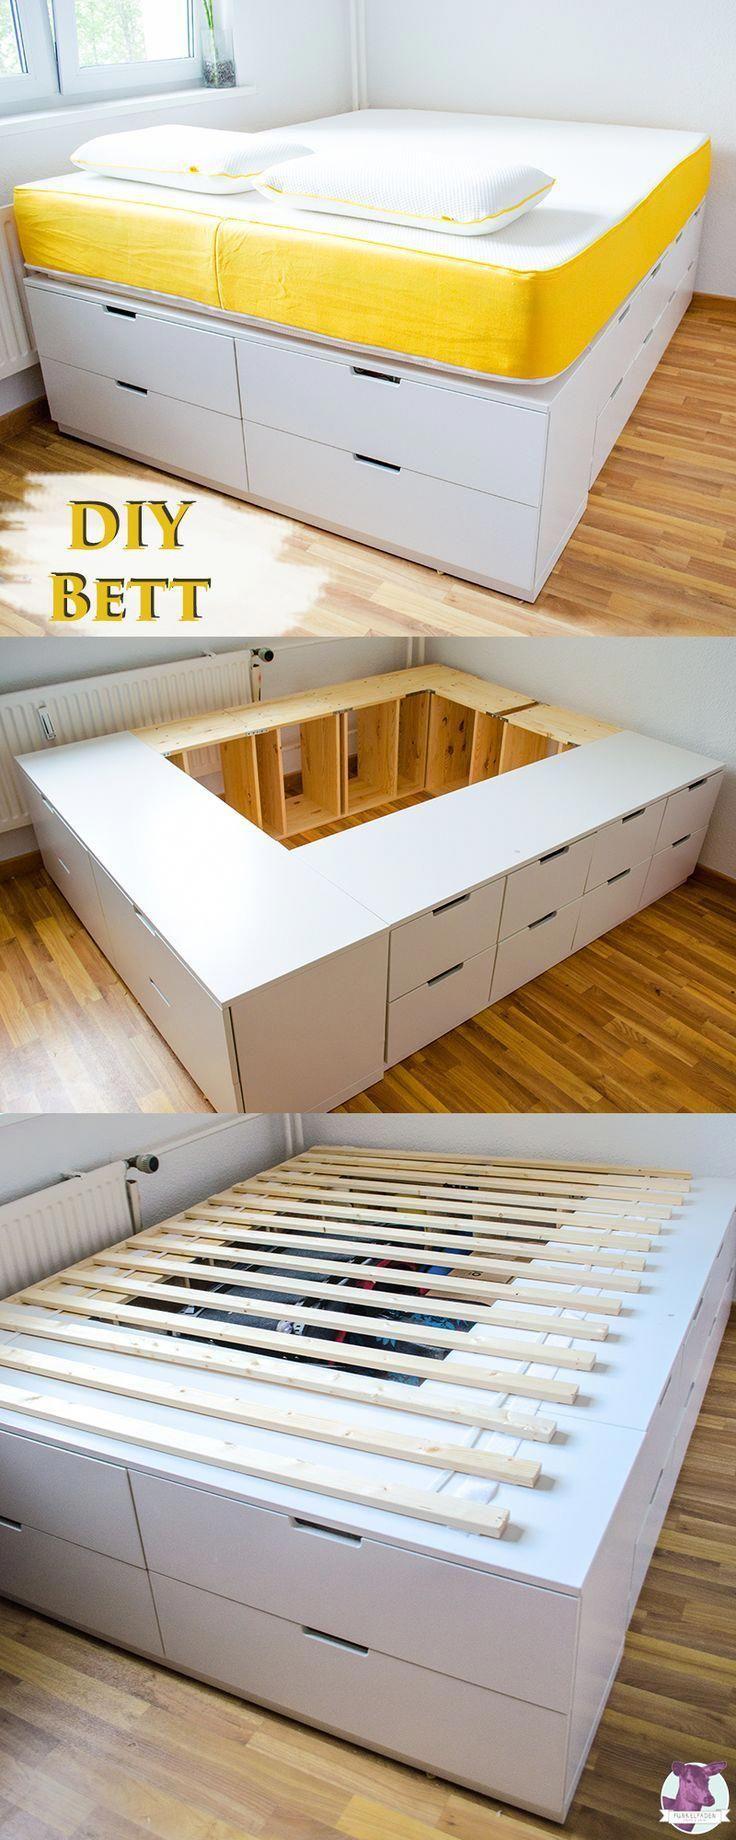 Photo of DIY IKEA HACk – Plattform-Bett selber bauen aus Ikea Kommoden /werbung